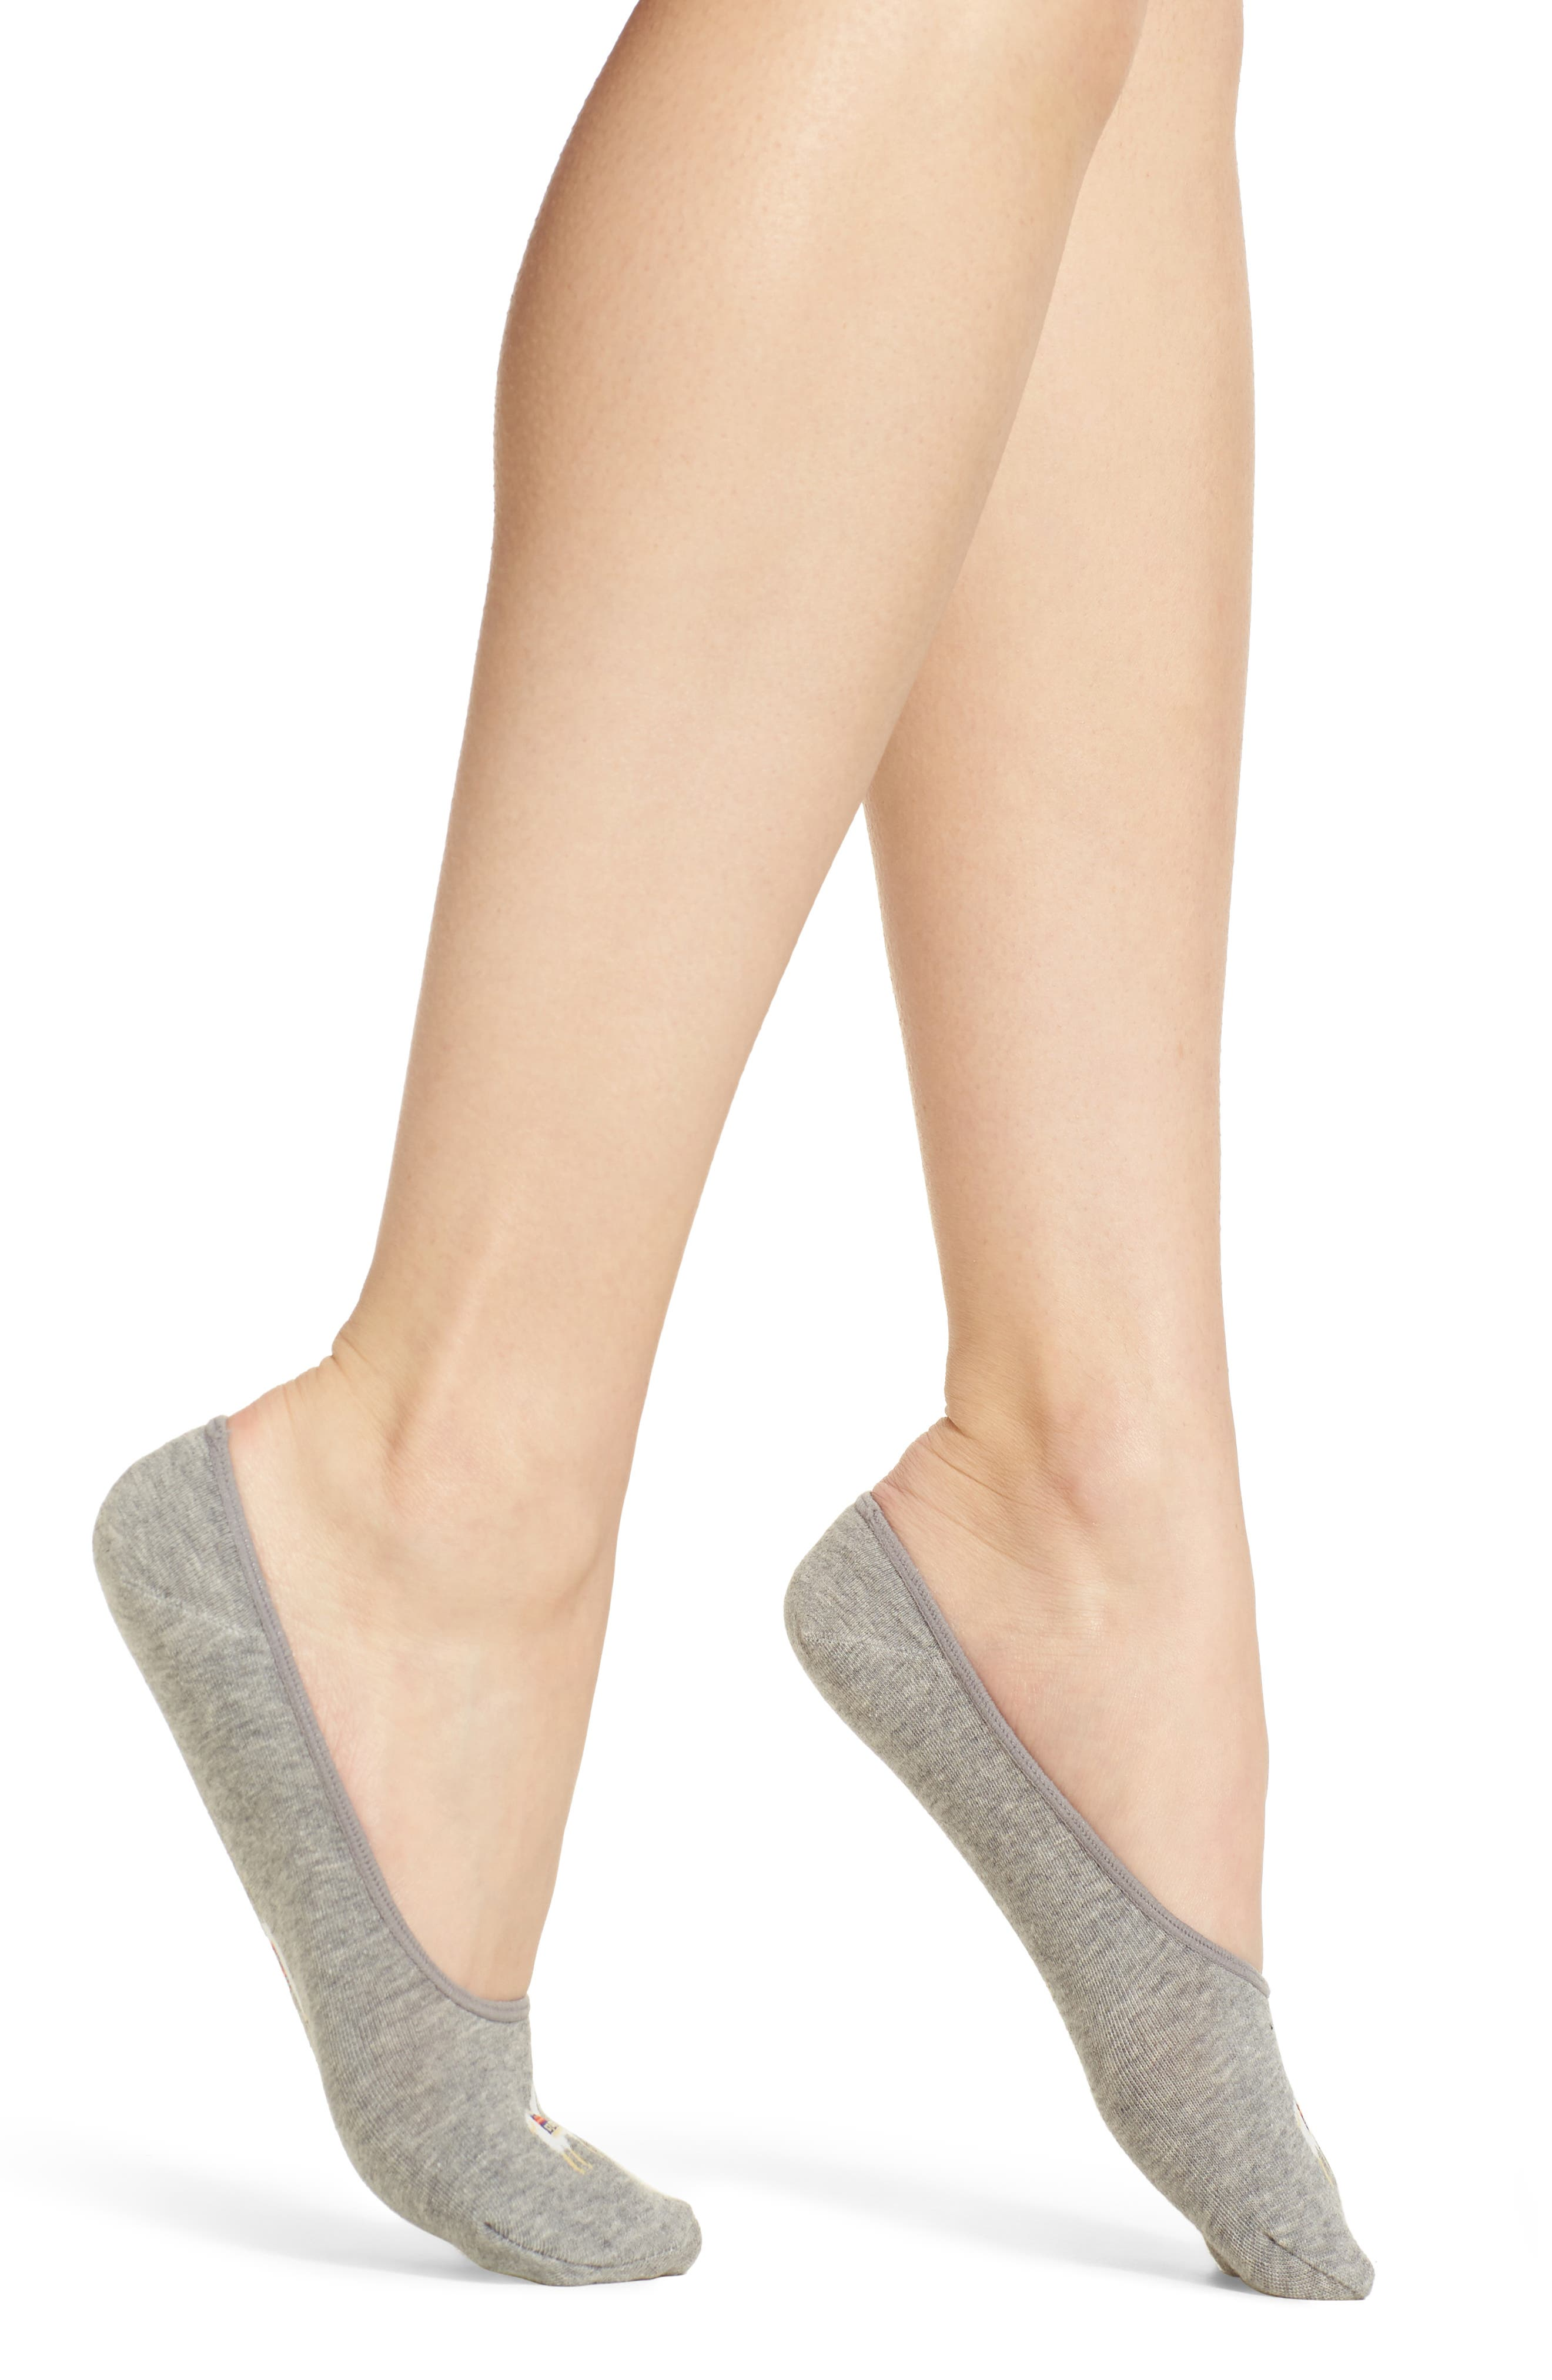 Llama Drama No-Show Socks,                         Main,                         color, 051